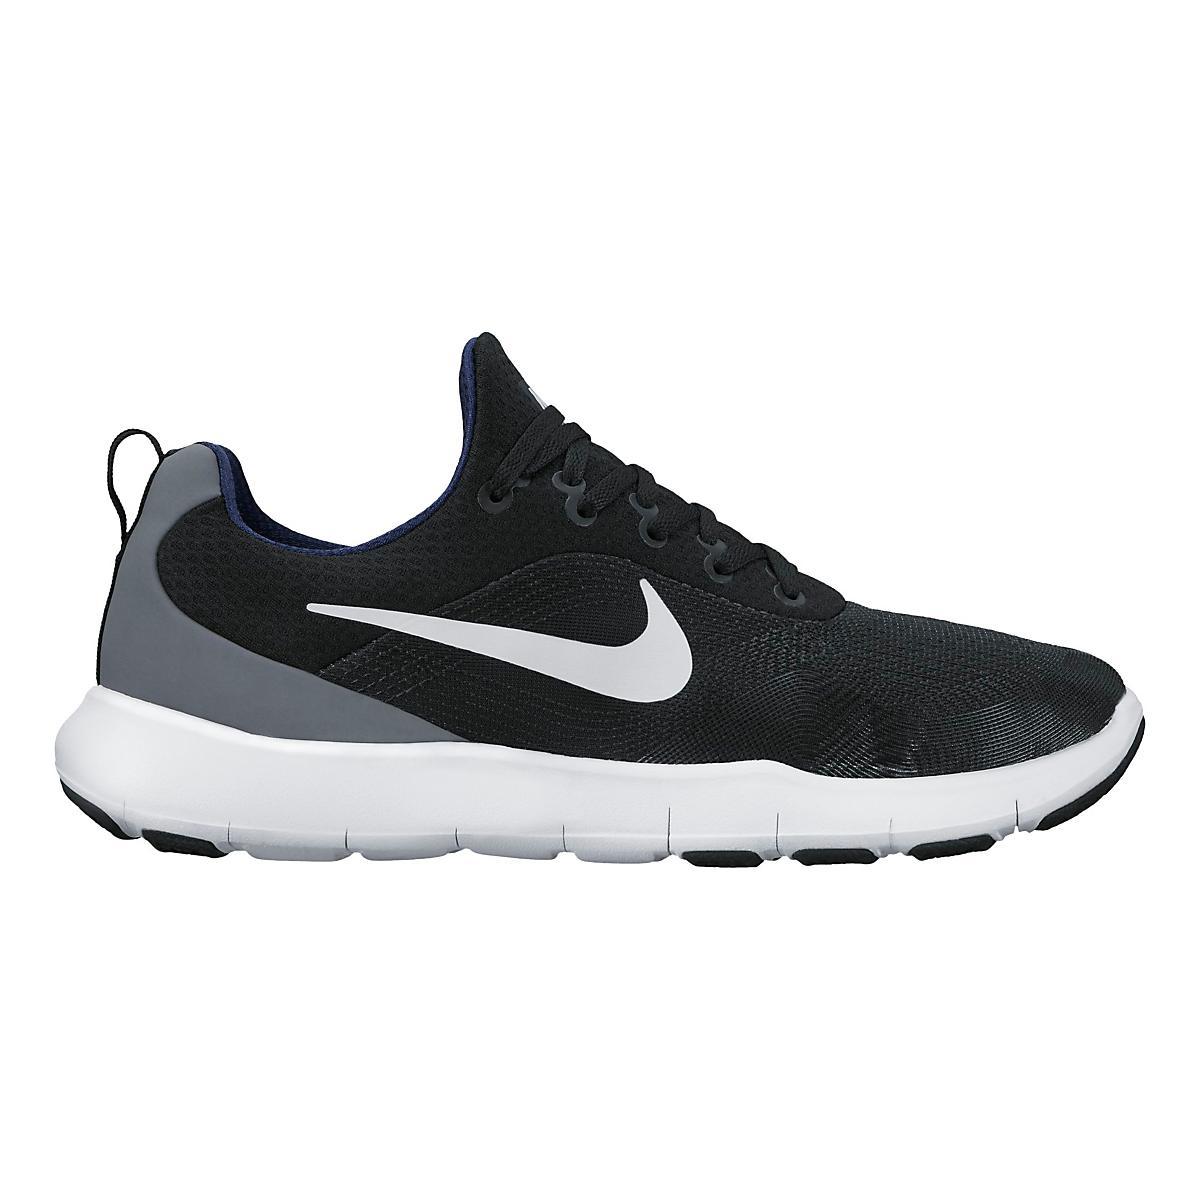 sports shoes ba7db 90e28 Mens Nike Free Trainer v7 Cross Training Shoe at Road Runner